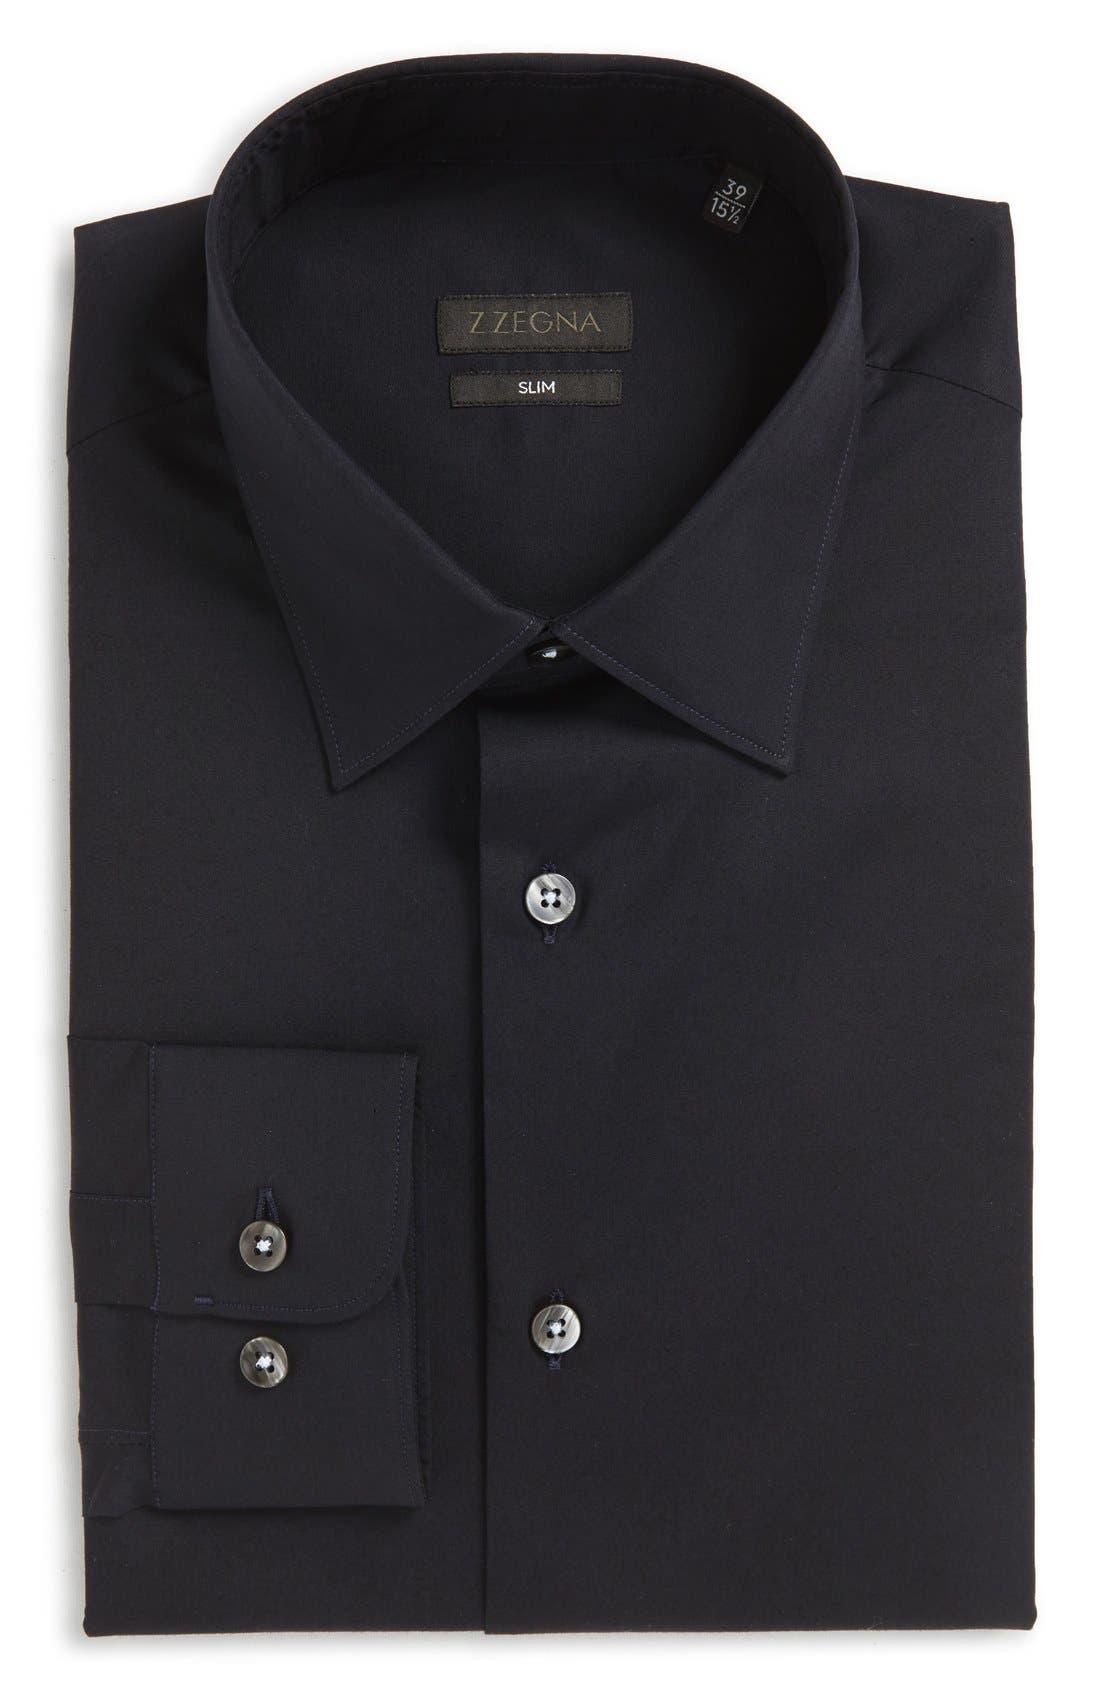 Main Image - Z Zegna Slim Fit Solid Stretch Dress Shirt